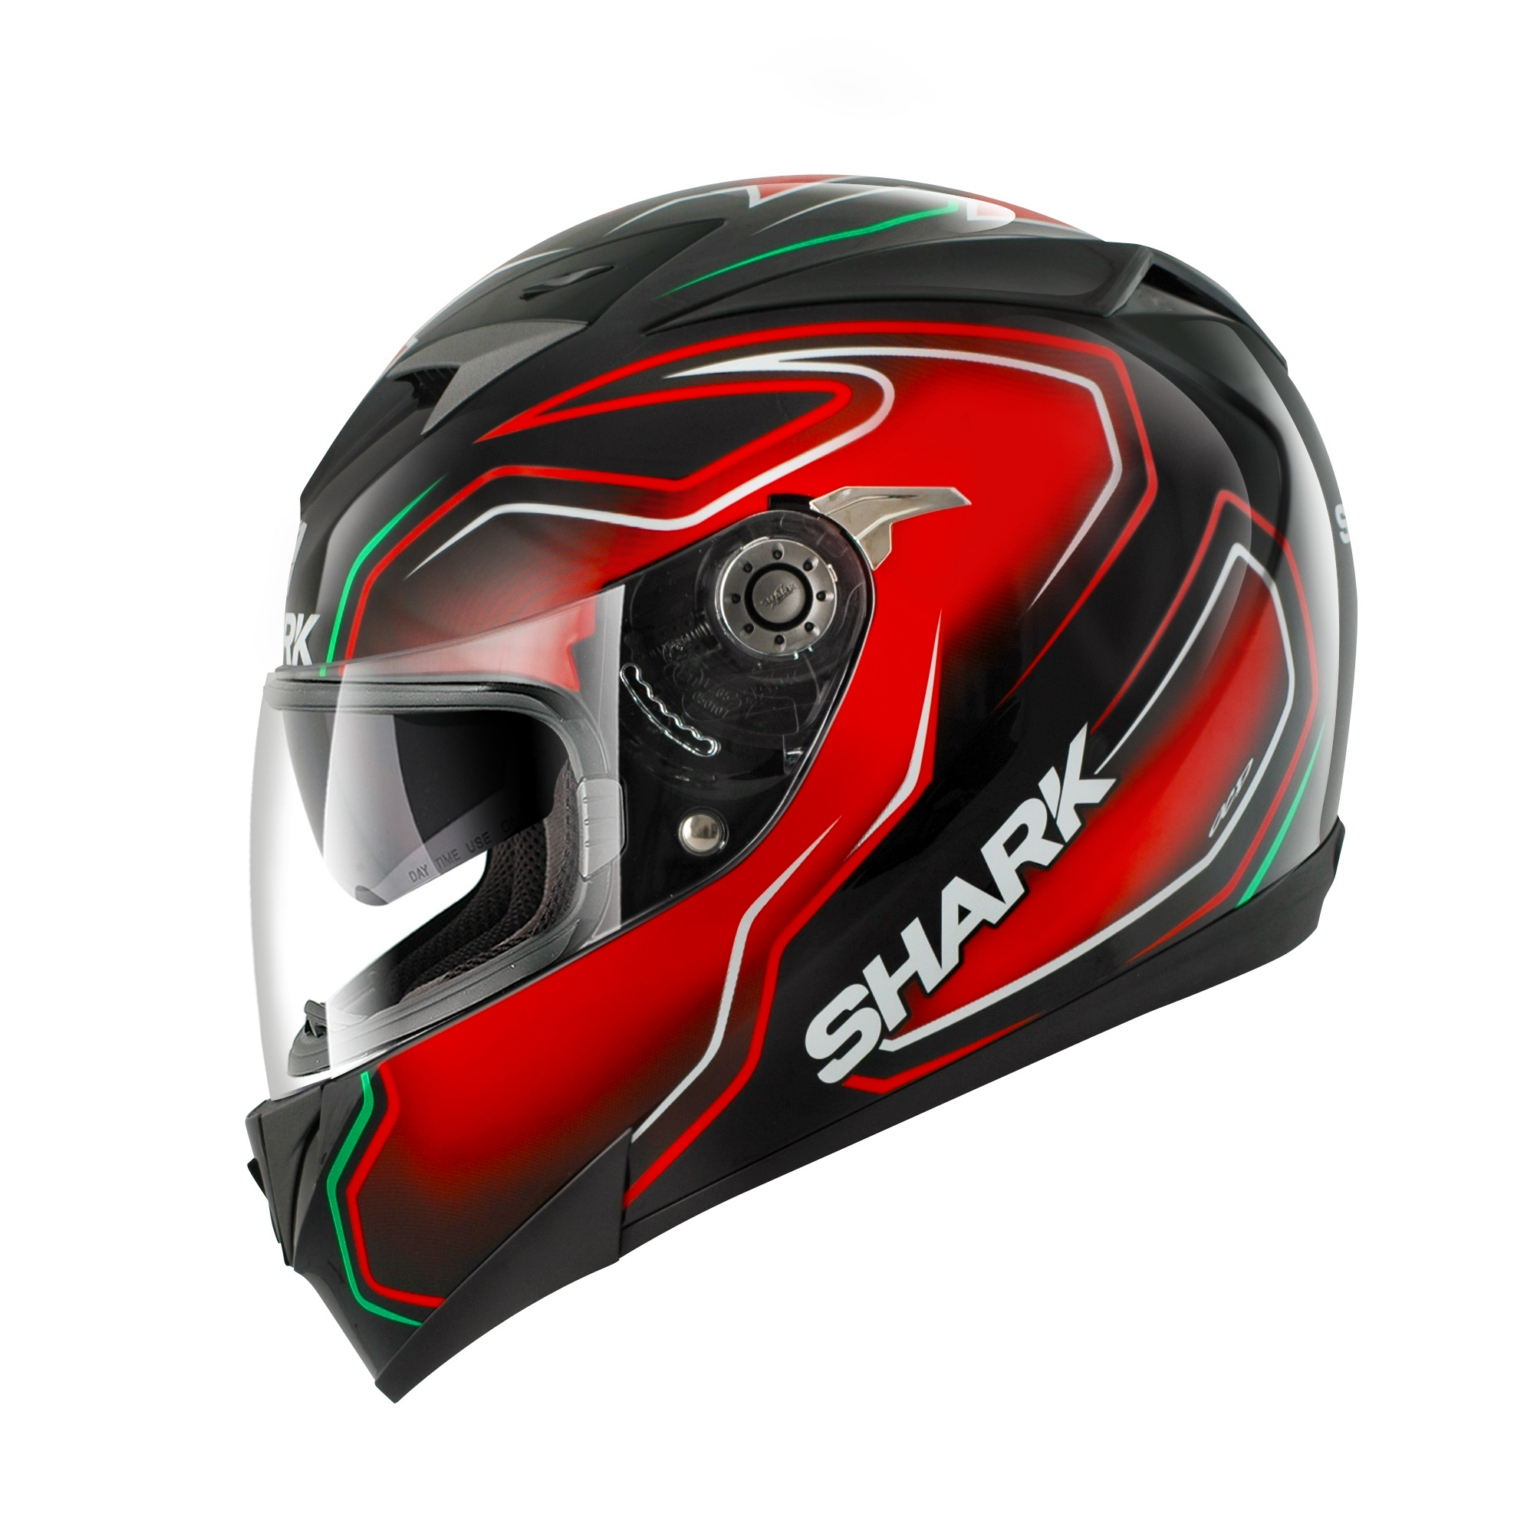 Shark Race R Pro Helmet Guntoli Replica